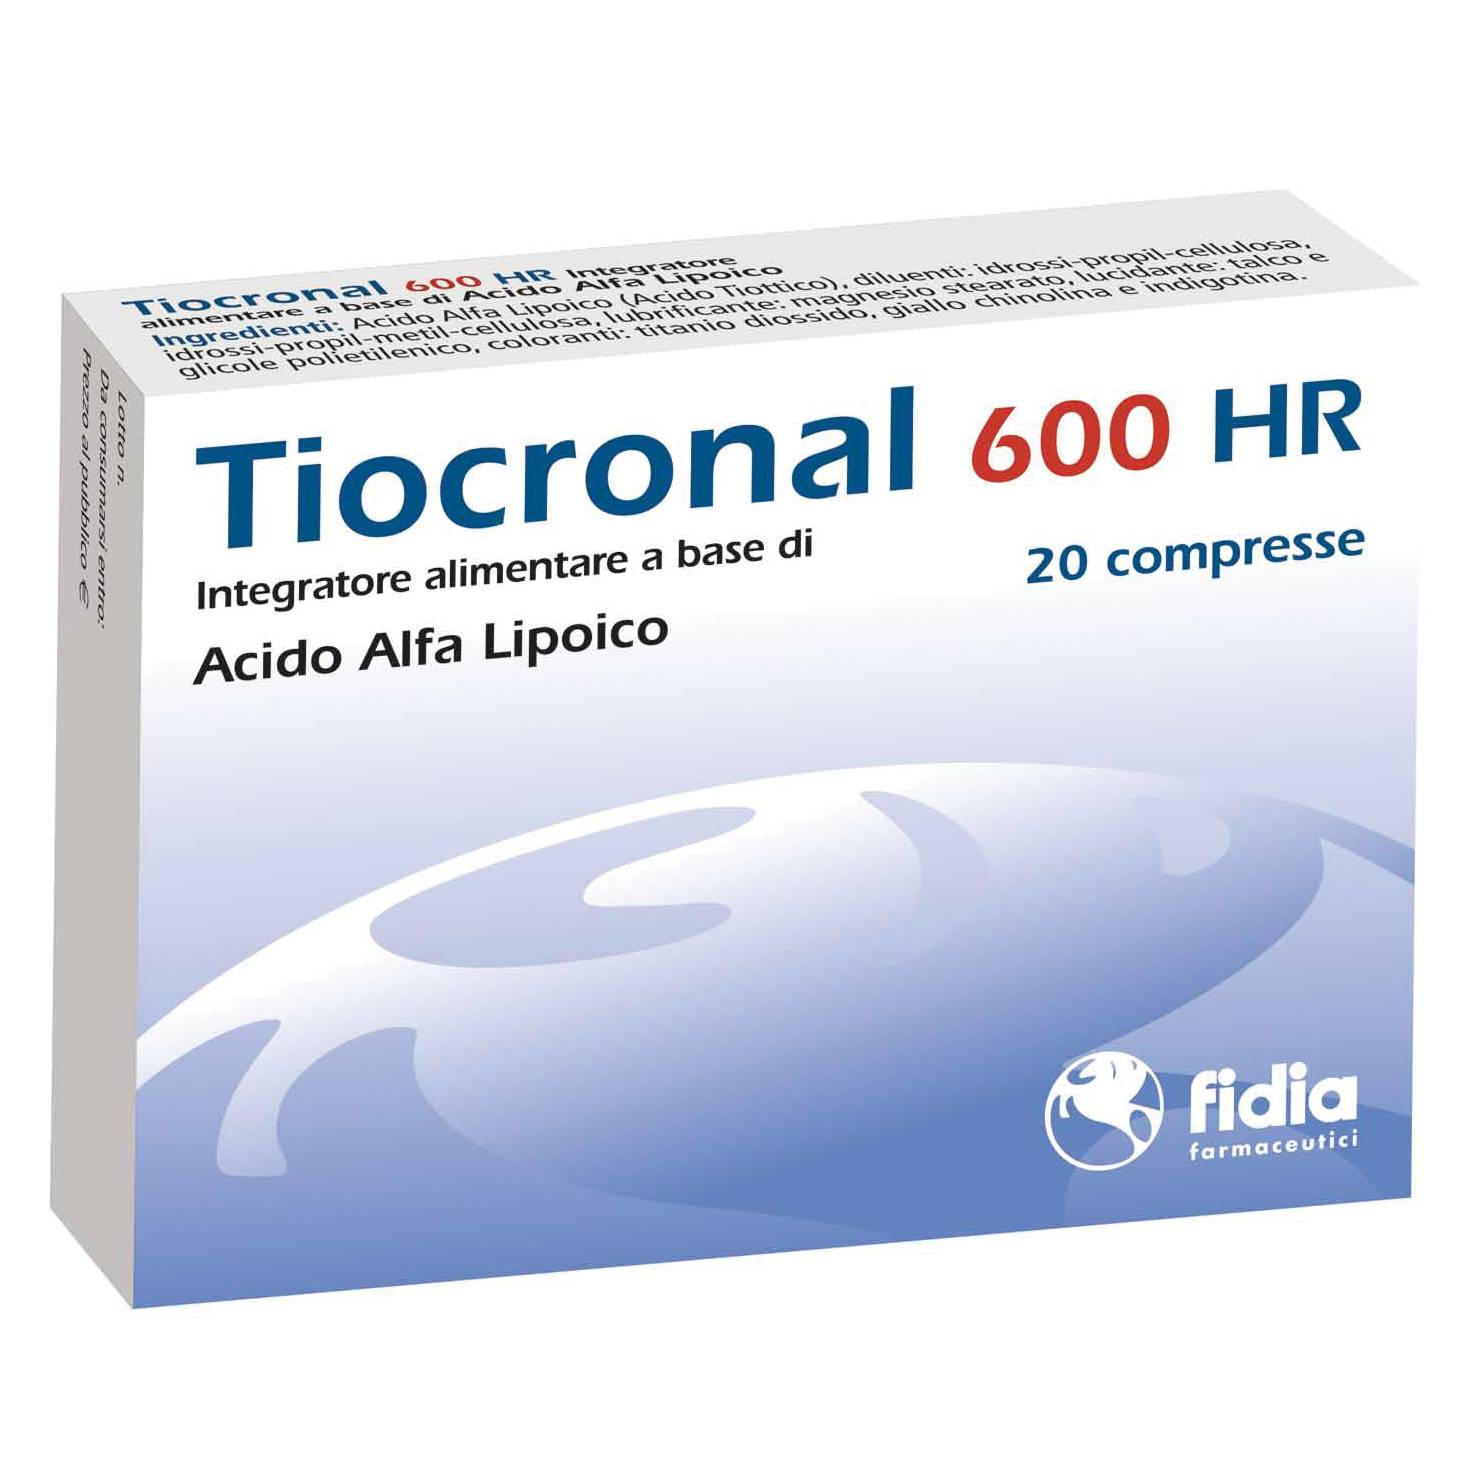 blv pharma group tiocronal 600-hr 20 cpr